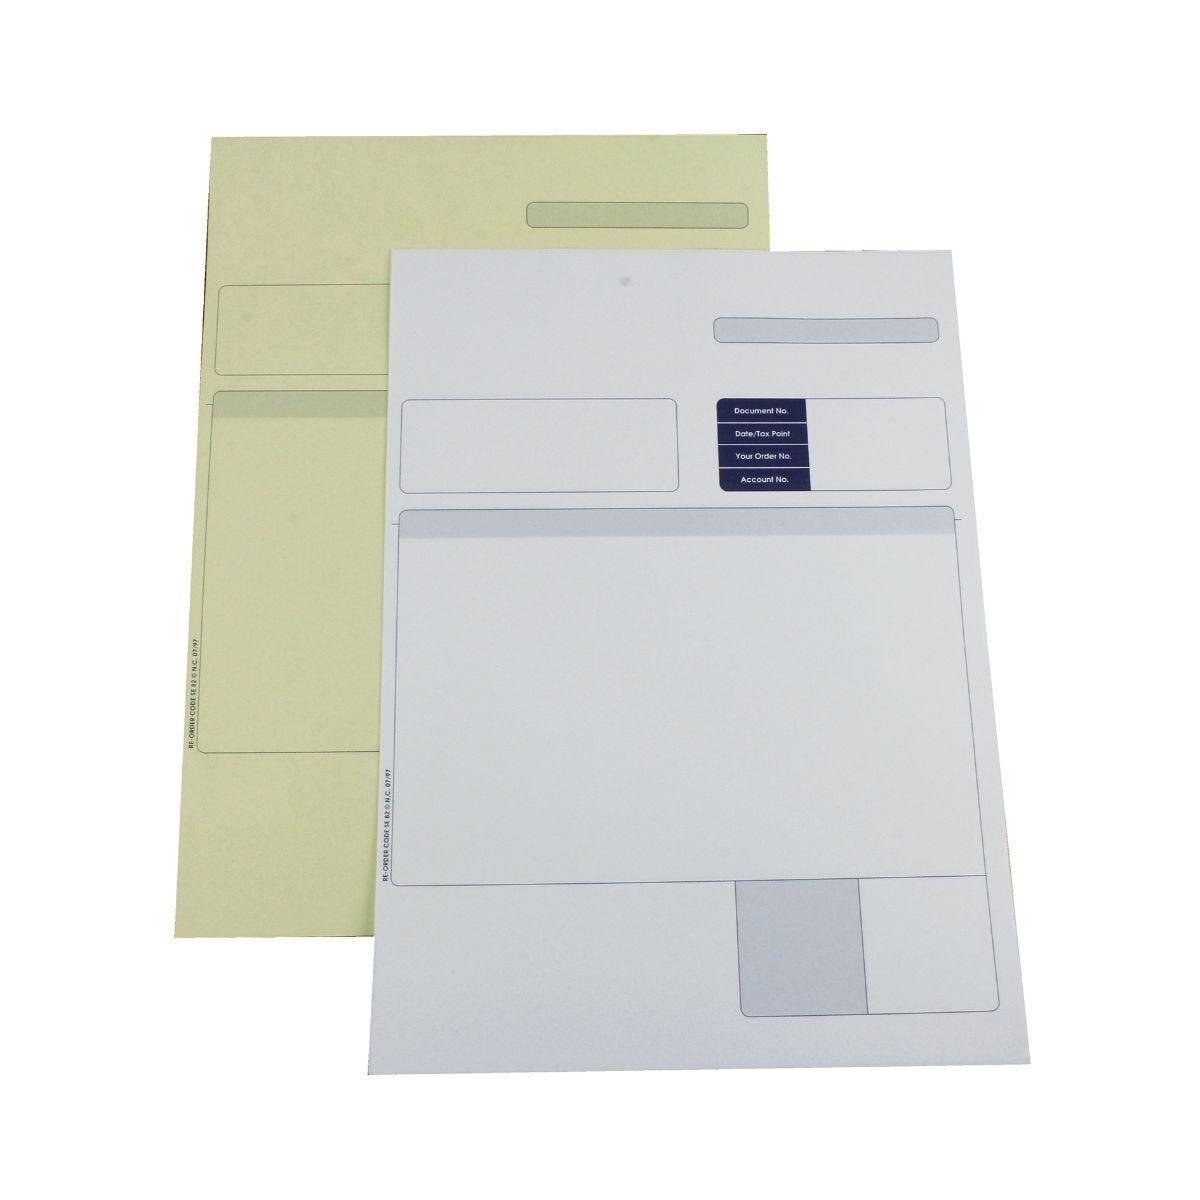 Custom Form Sage Compatible 2-Part Invoice for Laser & Inkjet Printers A4 Pack of 500